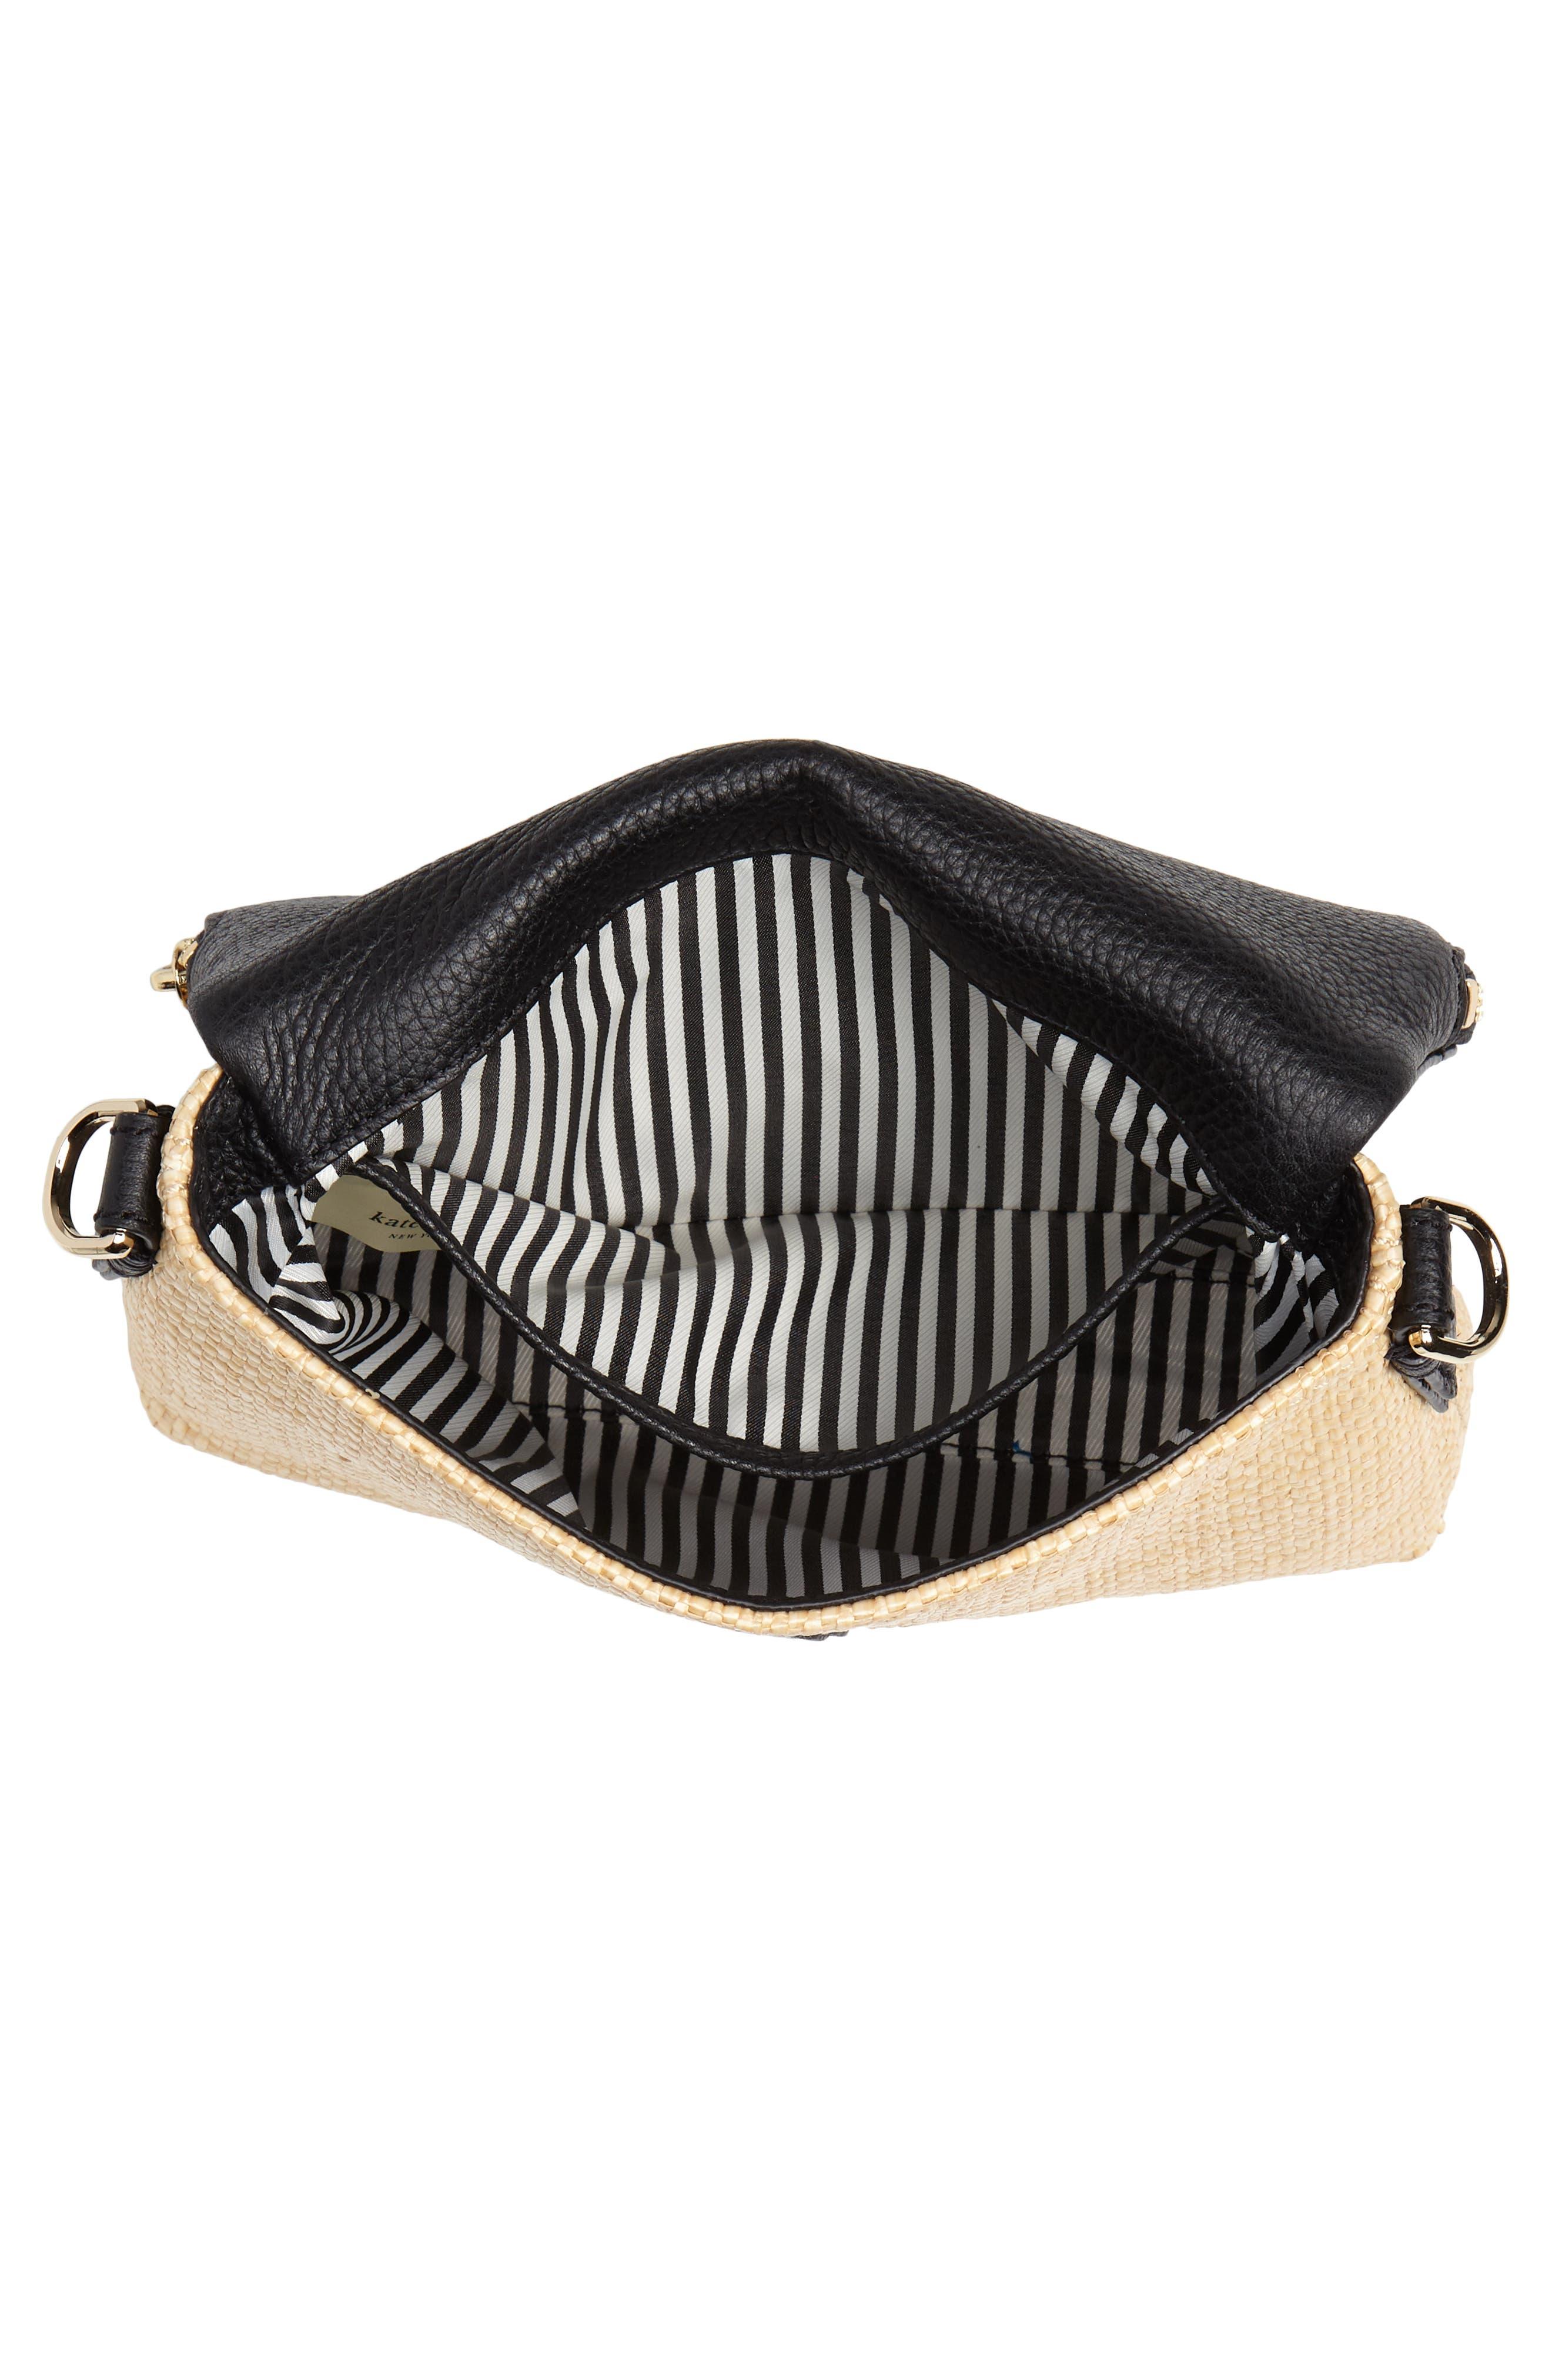 jackson street – harlyn straw & leather crossbody bag,                             Alternate thumbnail 6, color,                             Light Natural